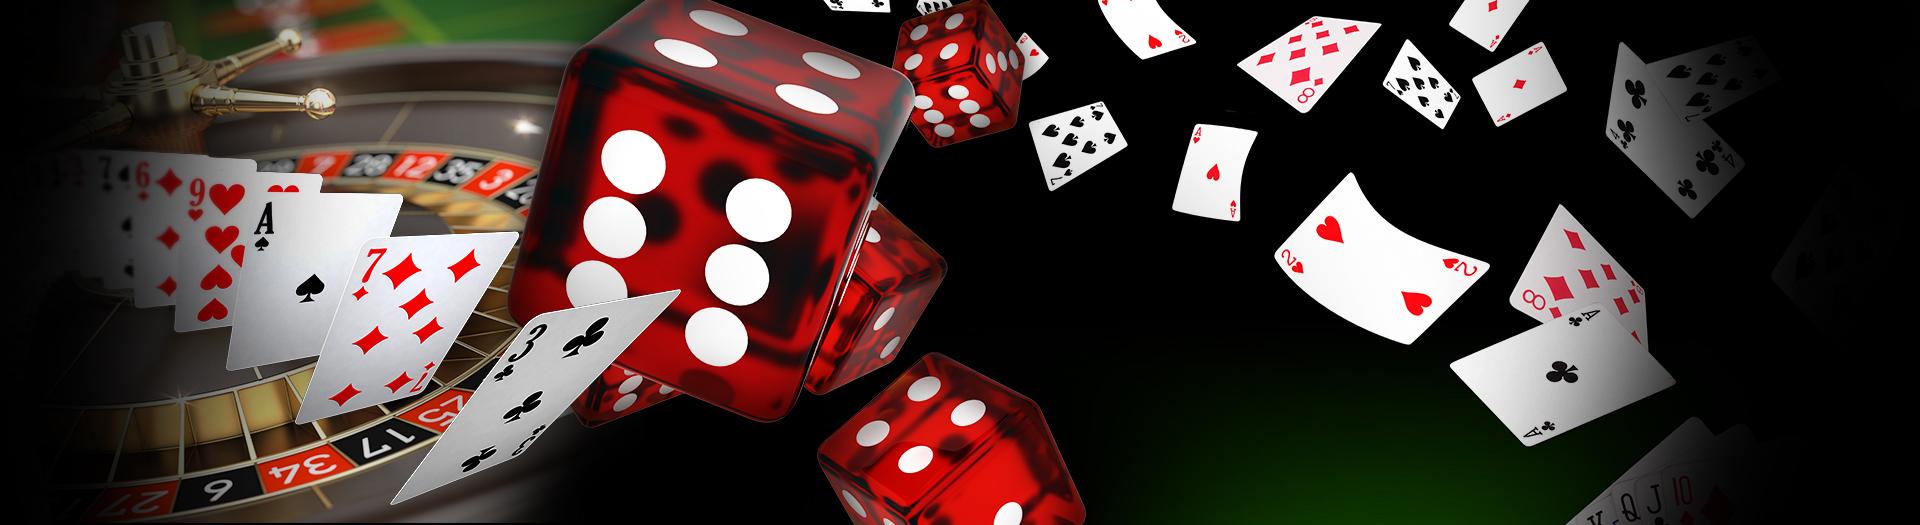 888 poker instalar noticias casino-762679